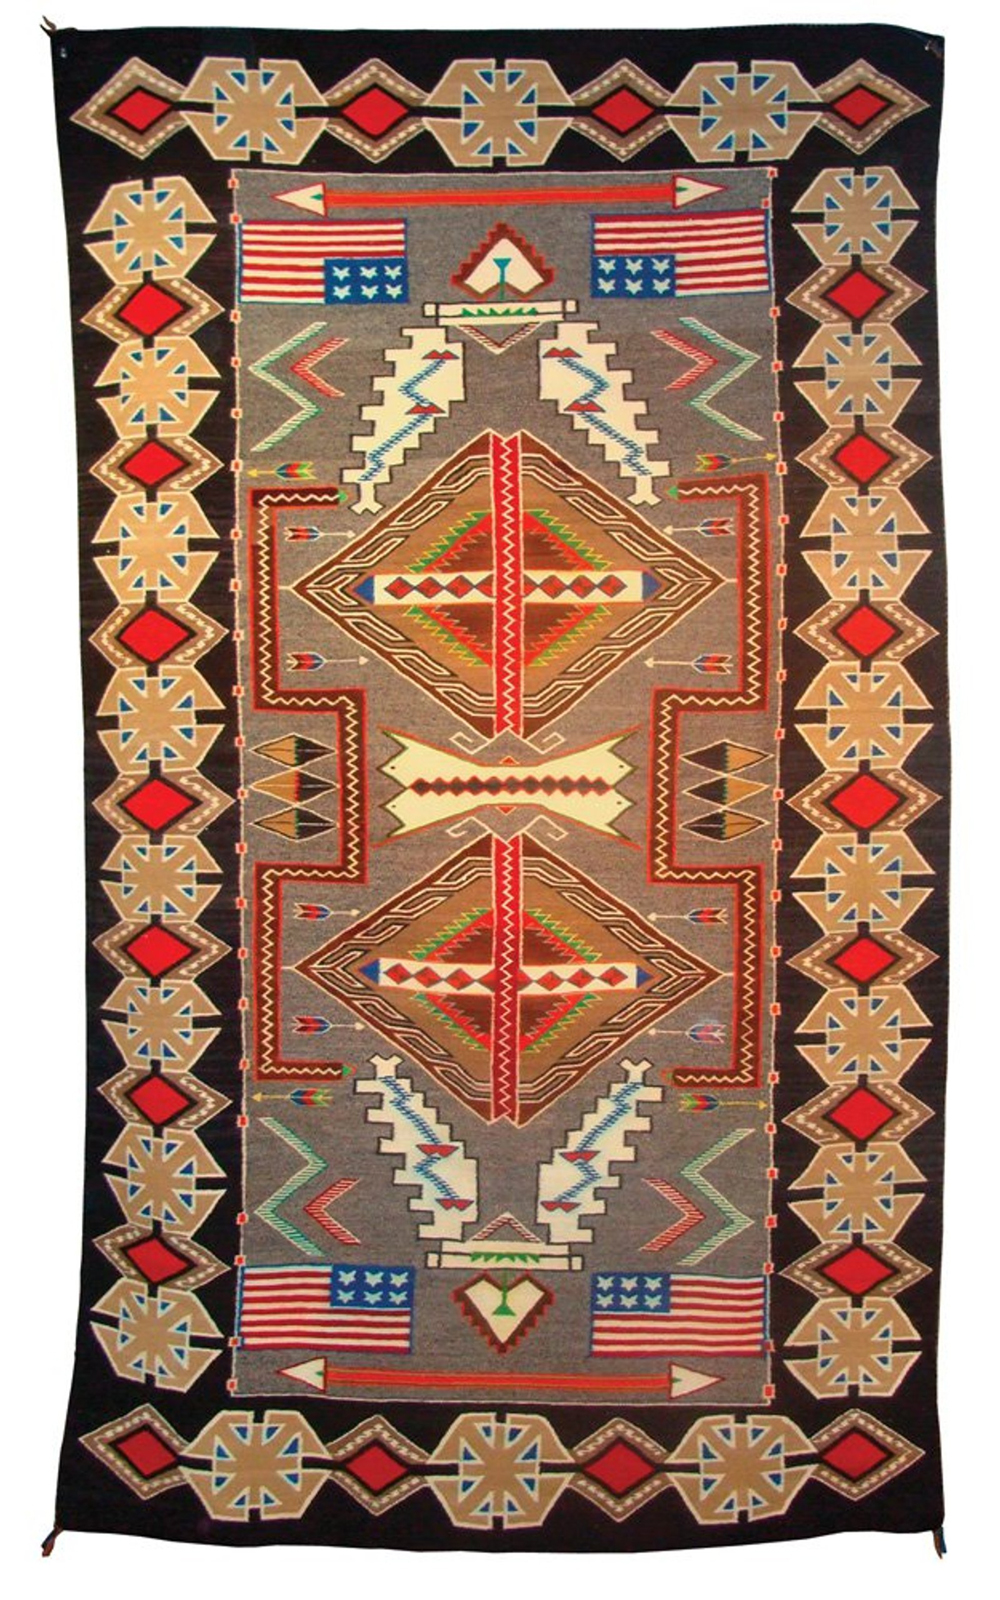 Circa-1950 Navajo pictorial Teec Nos Pos rug